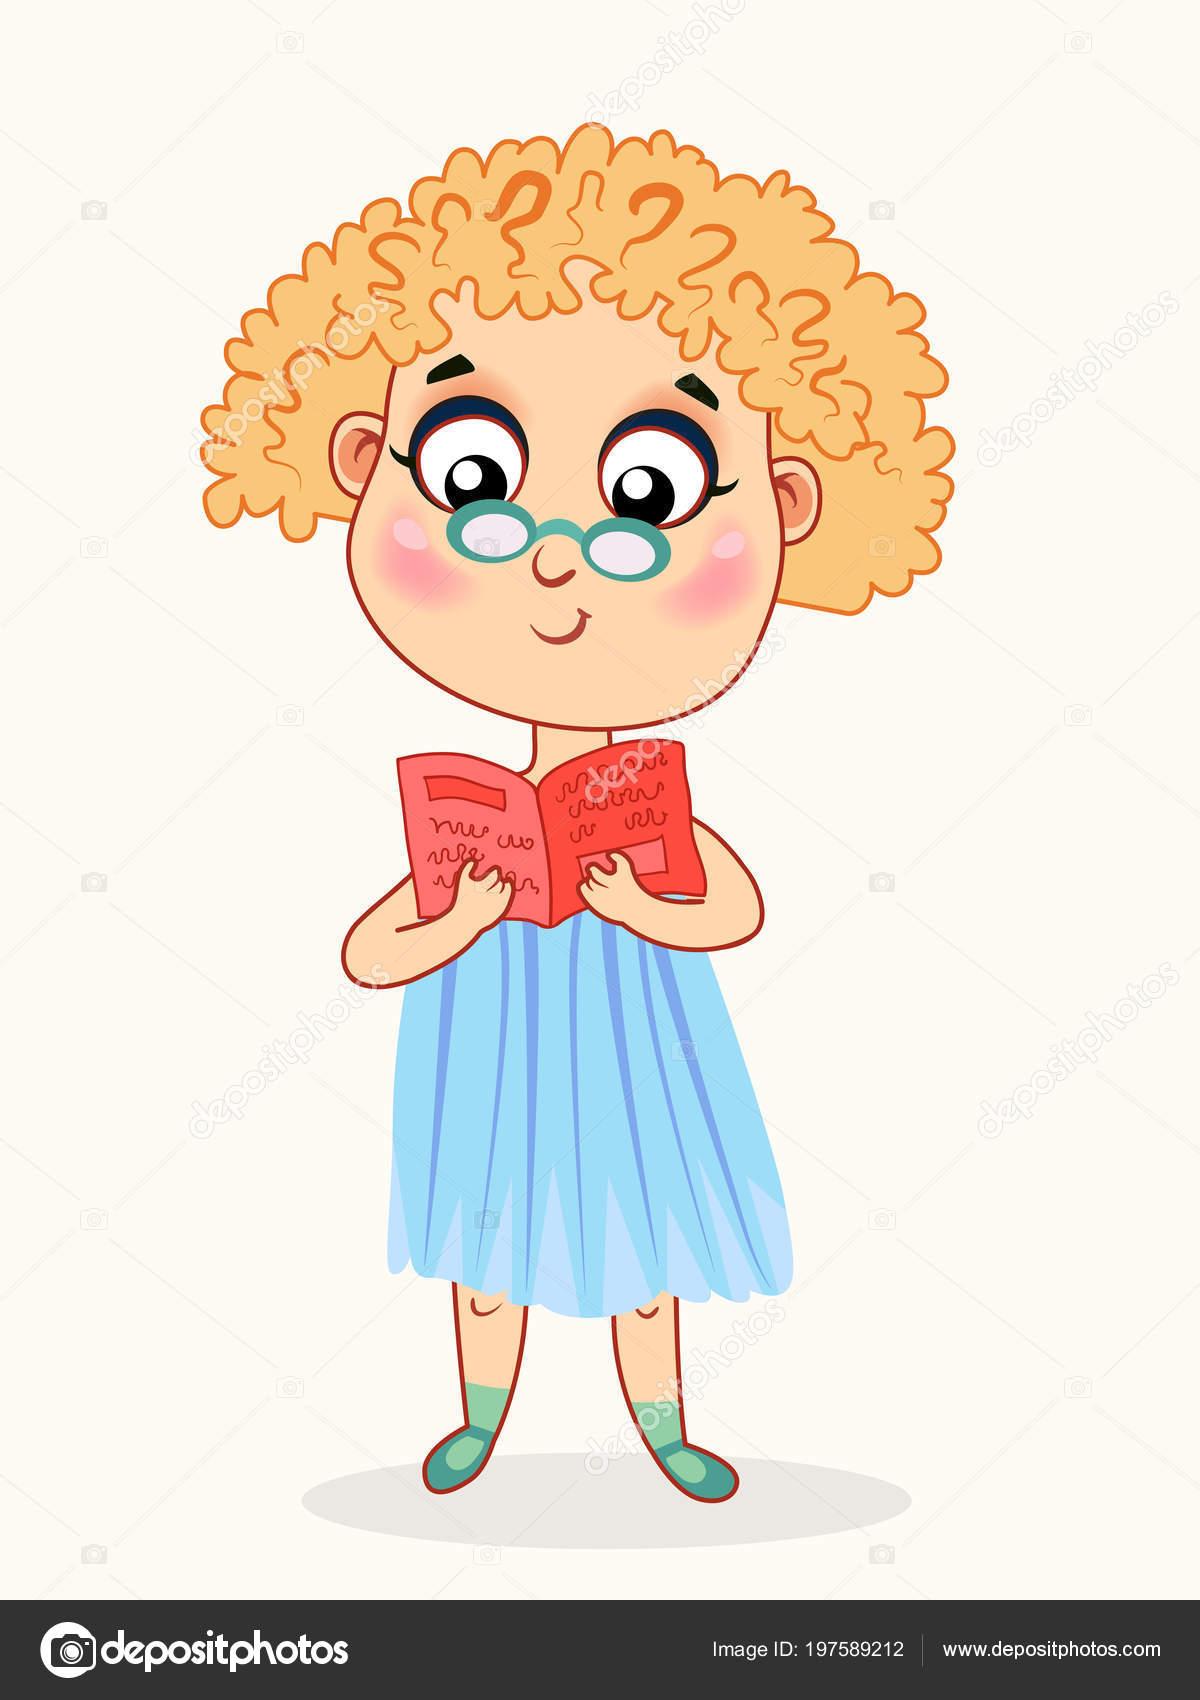 Petite Fille De Dessin Animé Lisant Un Livre Image